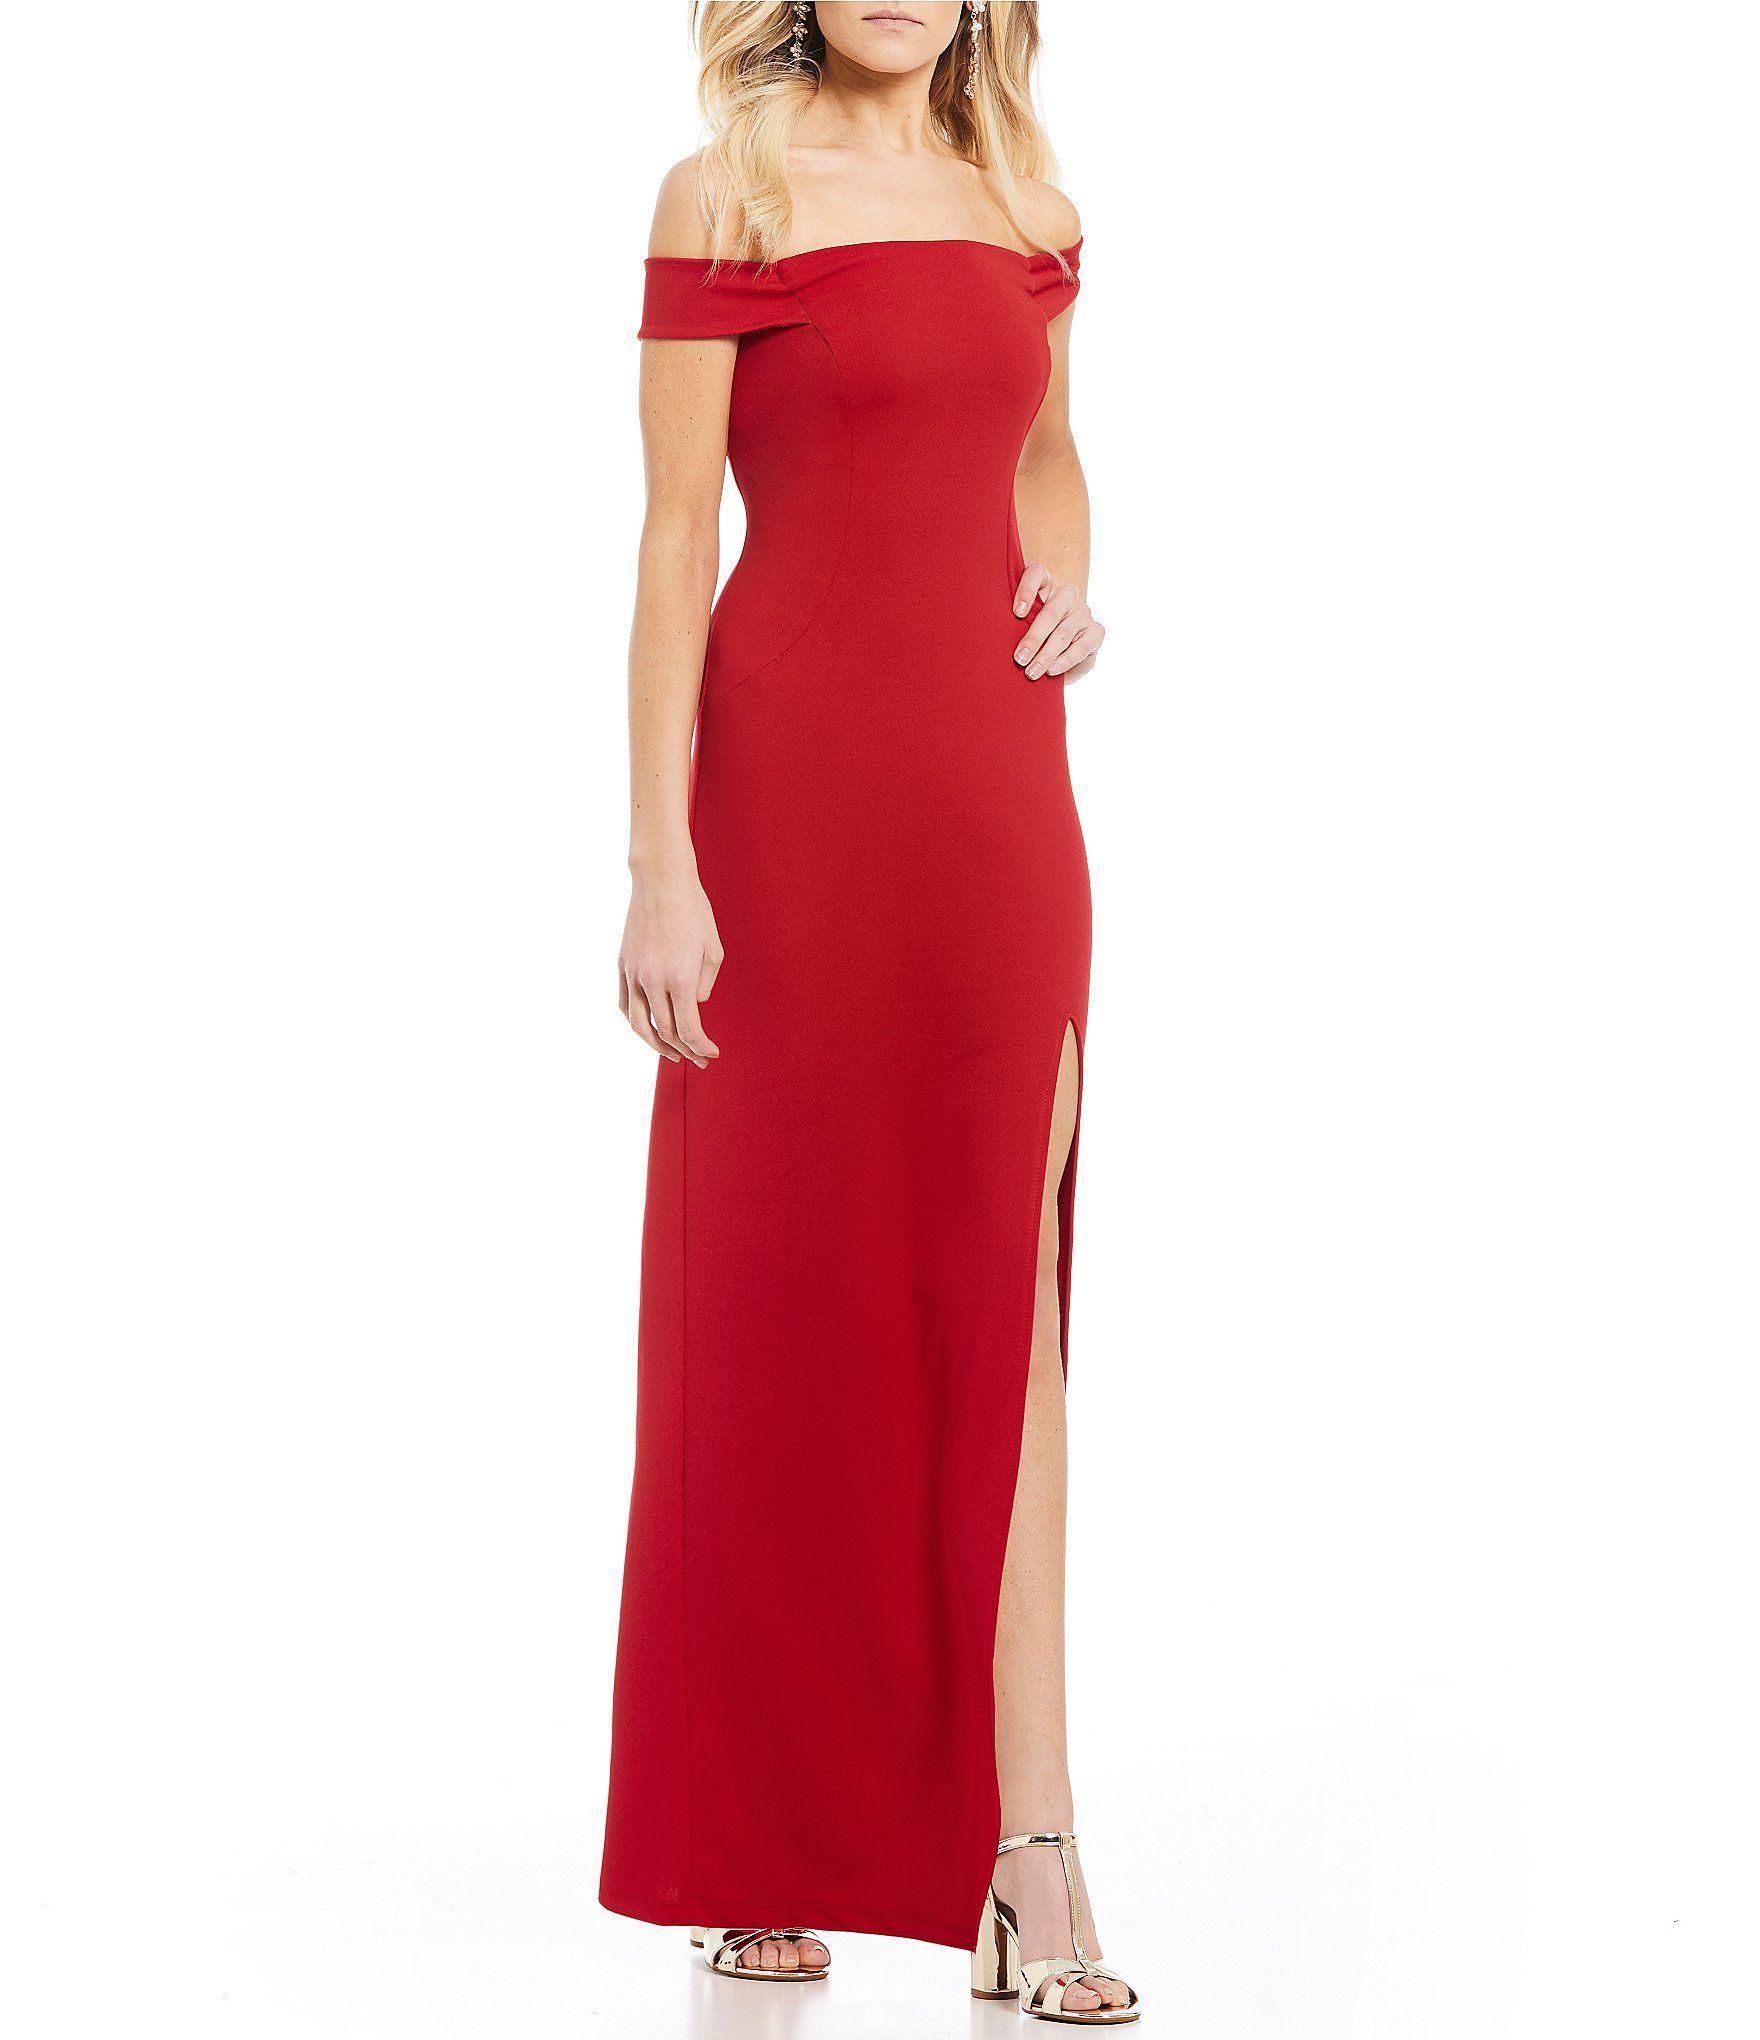 9150ea46cc7 Shop for Teeze Me Off-The-Shoulder Long Dress at Dillards.com. Visit  Dillards.com to find clothing